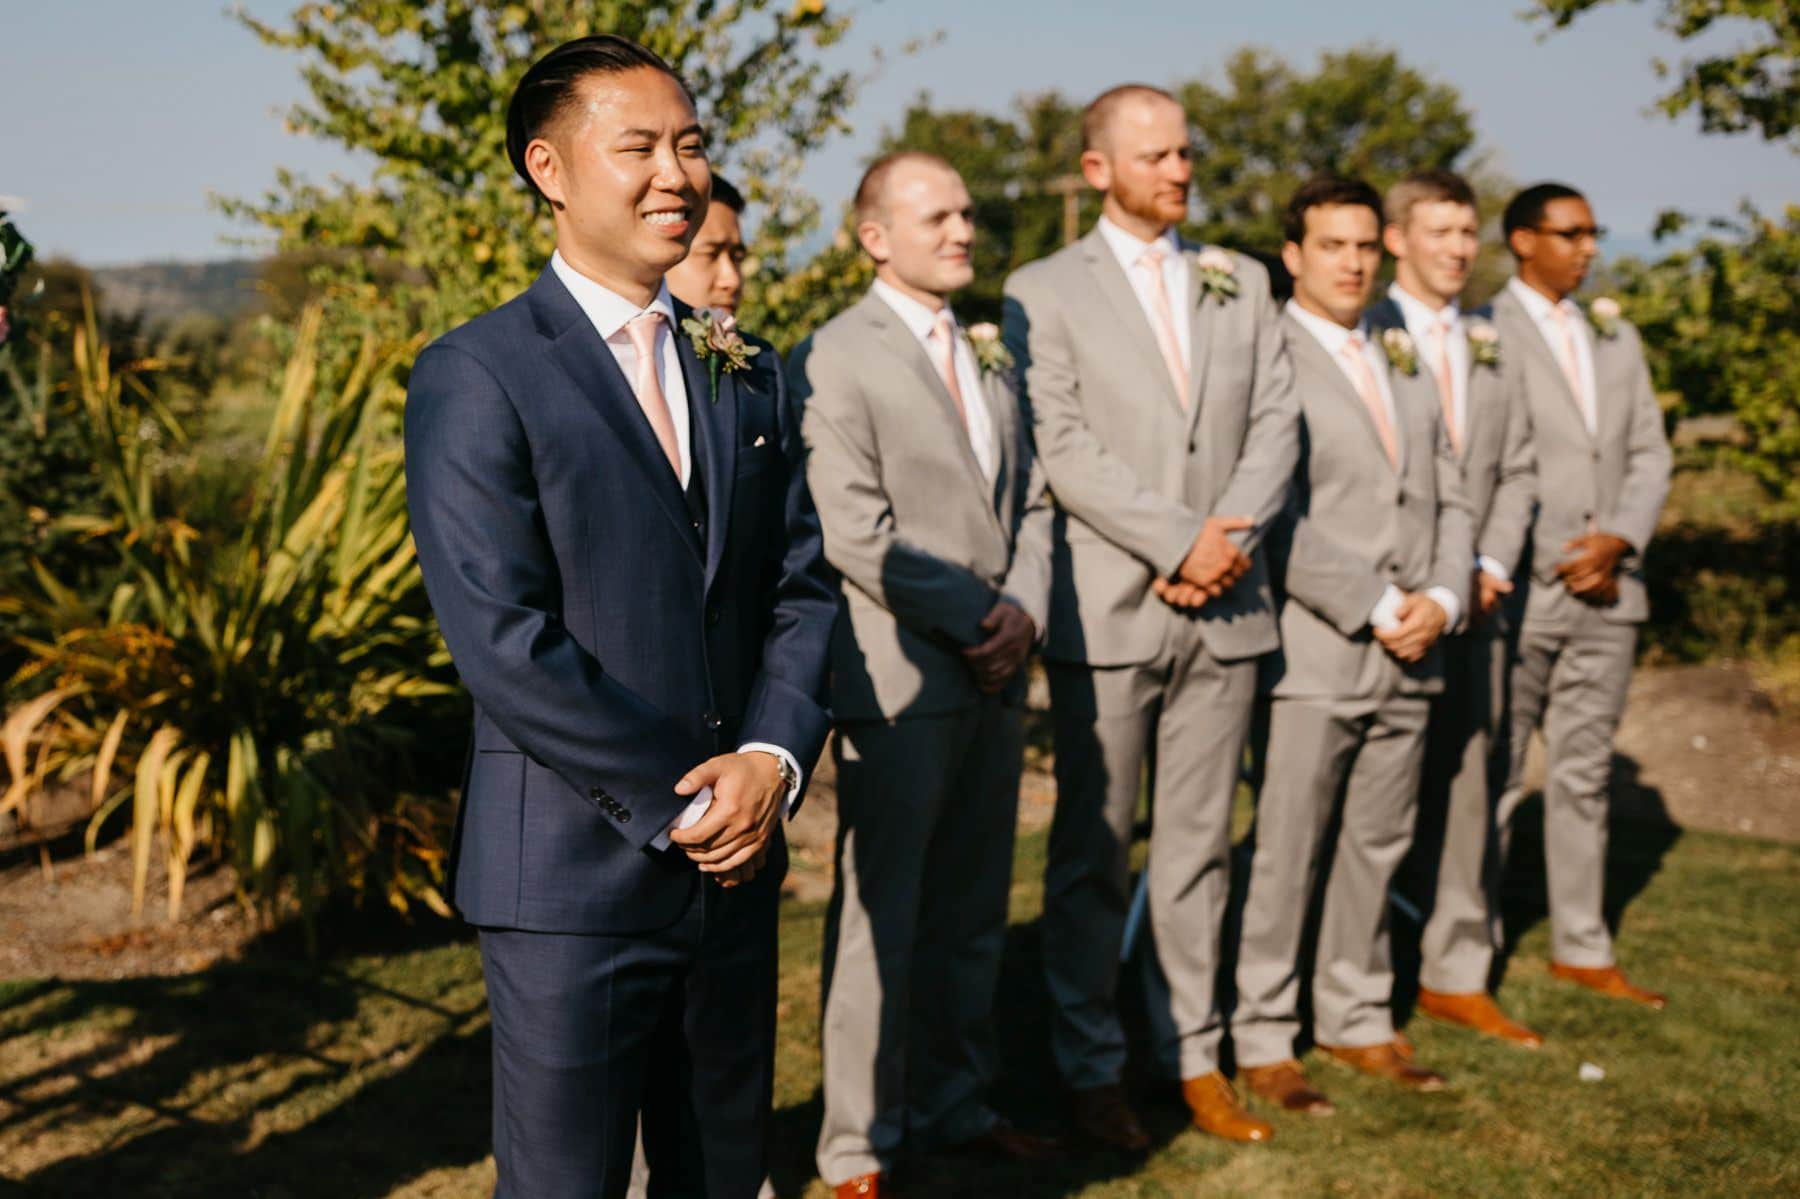 dairyland wedding ceremony august